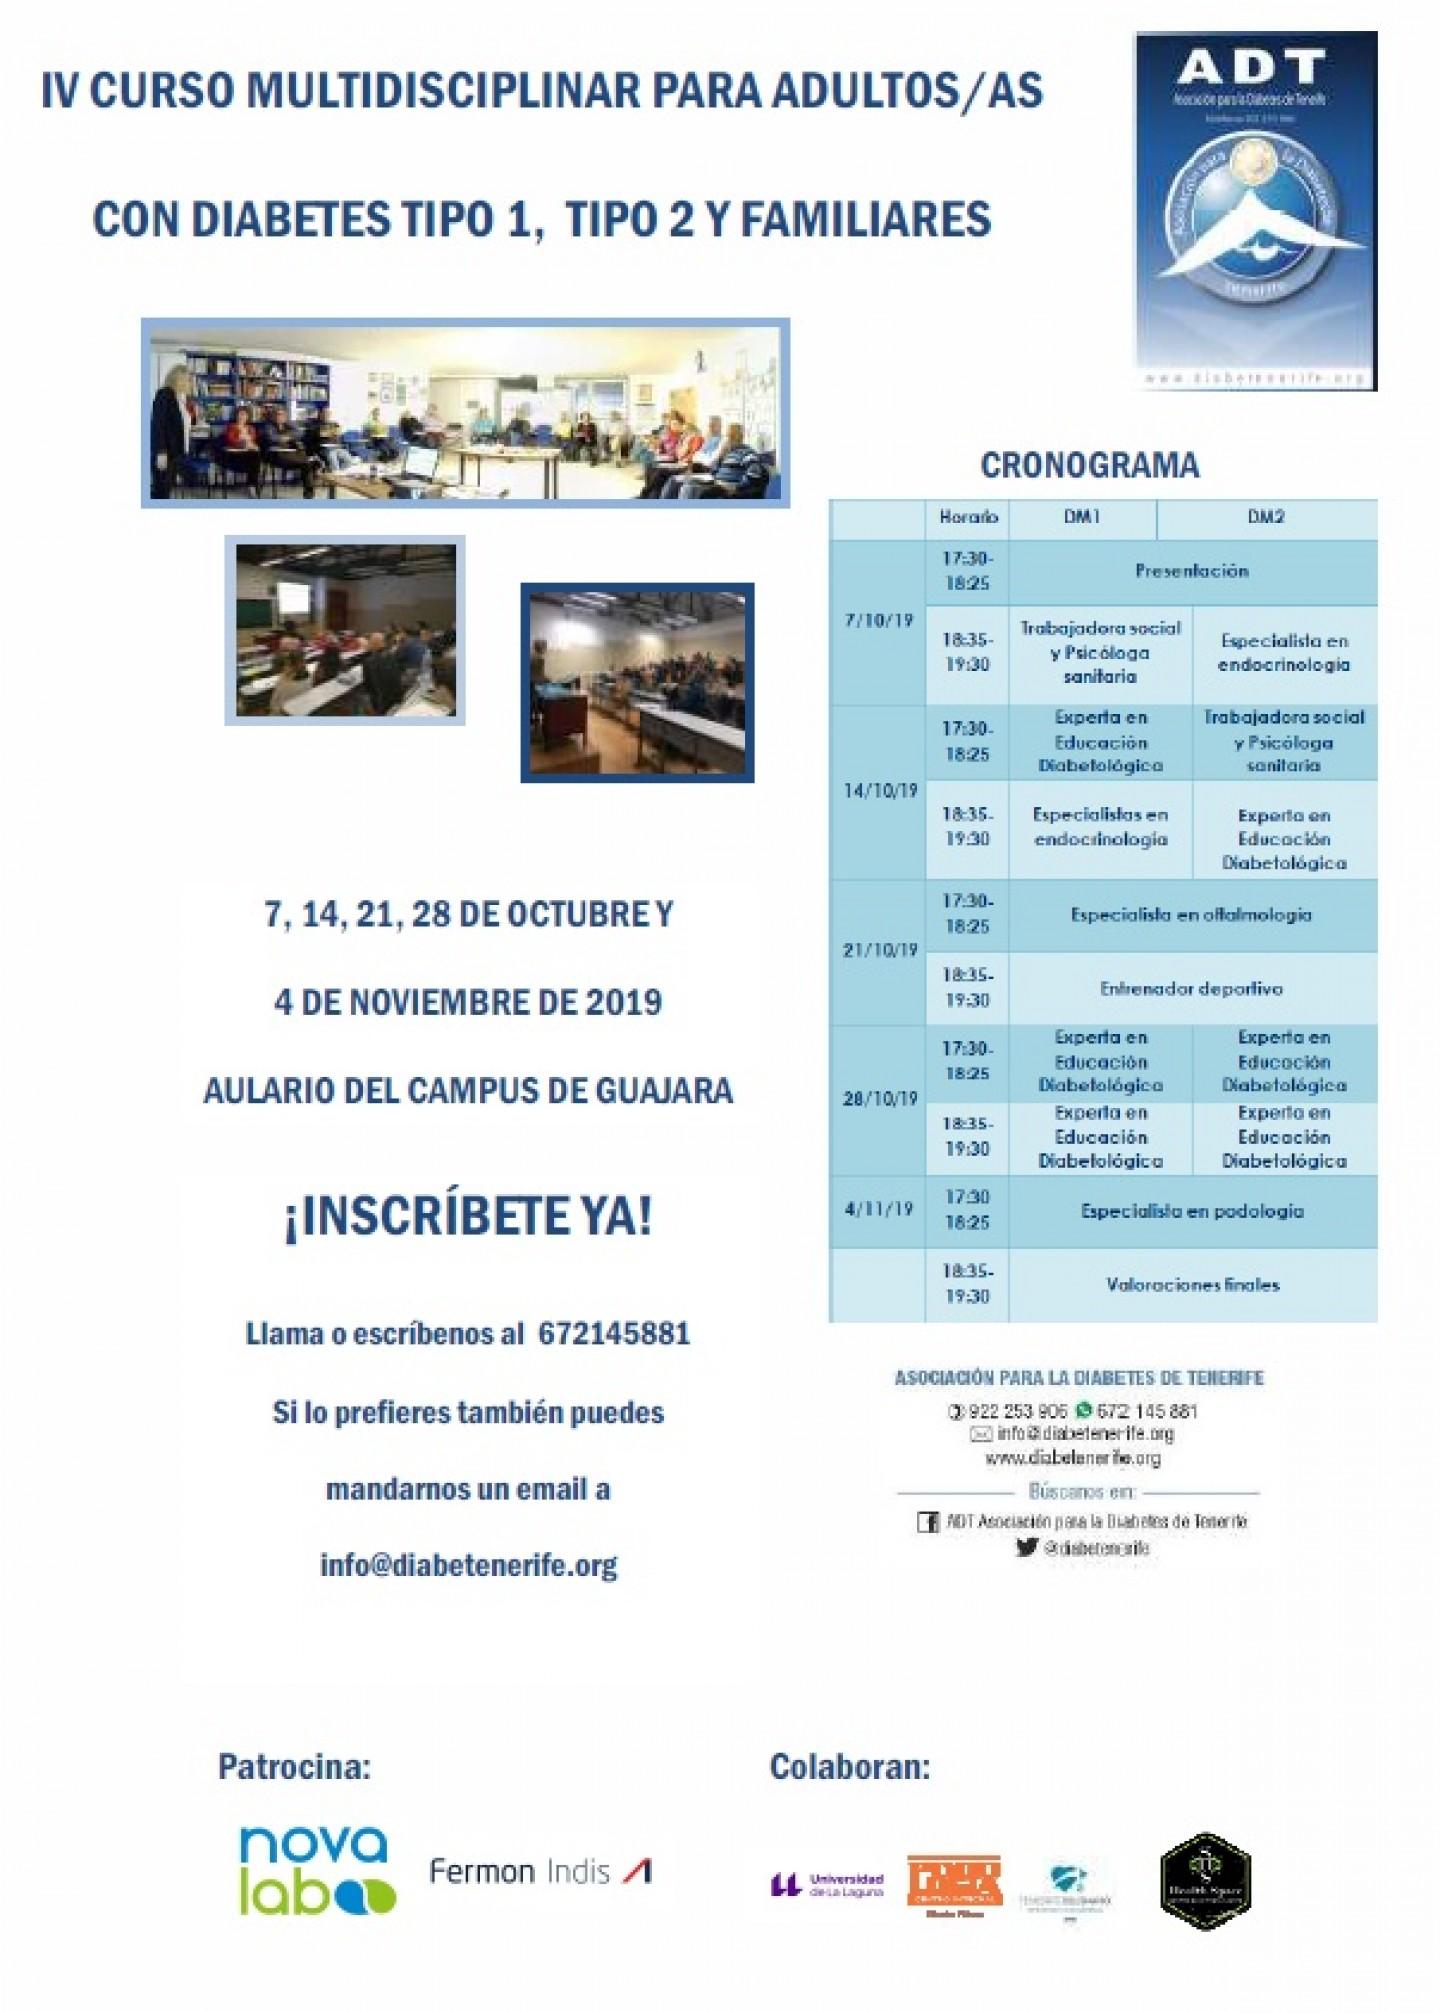 folleto de diabetes pediátrica español